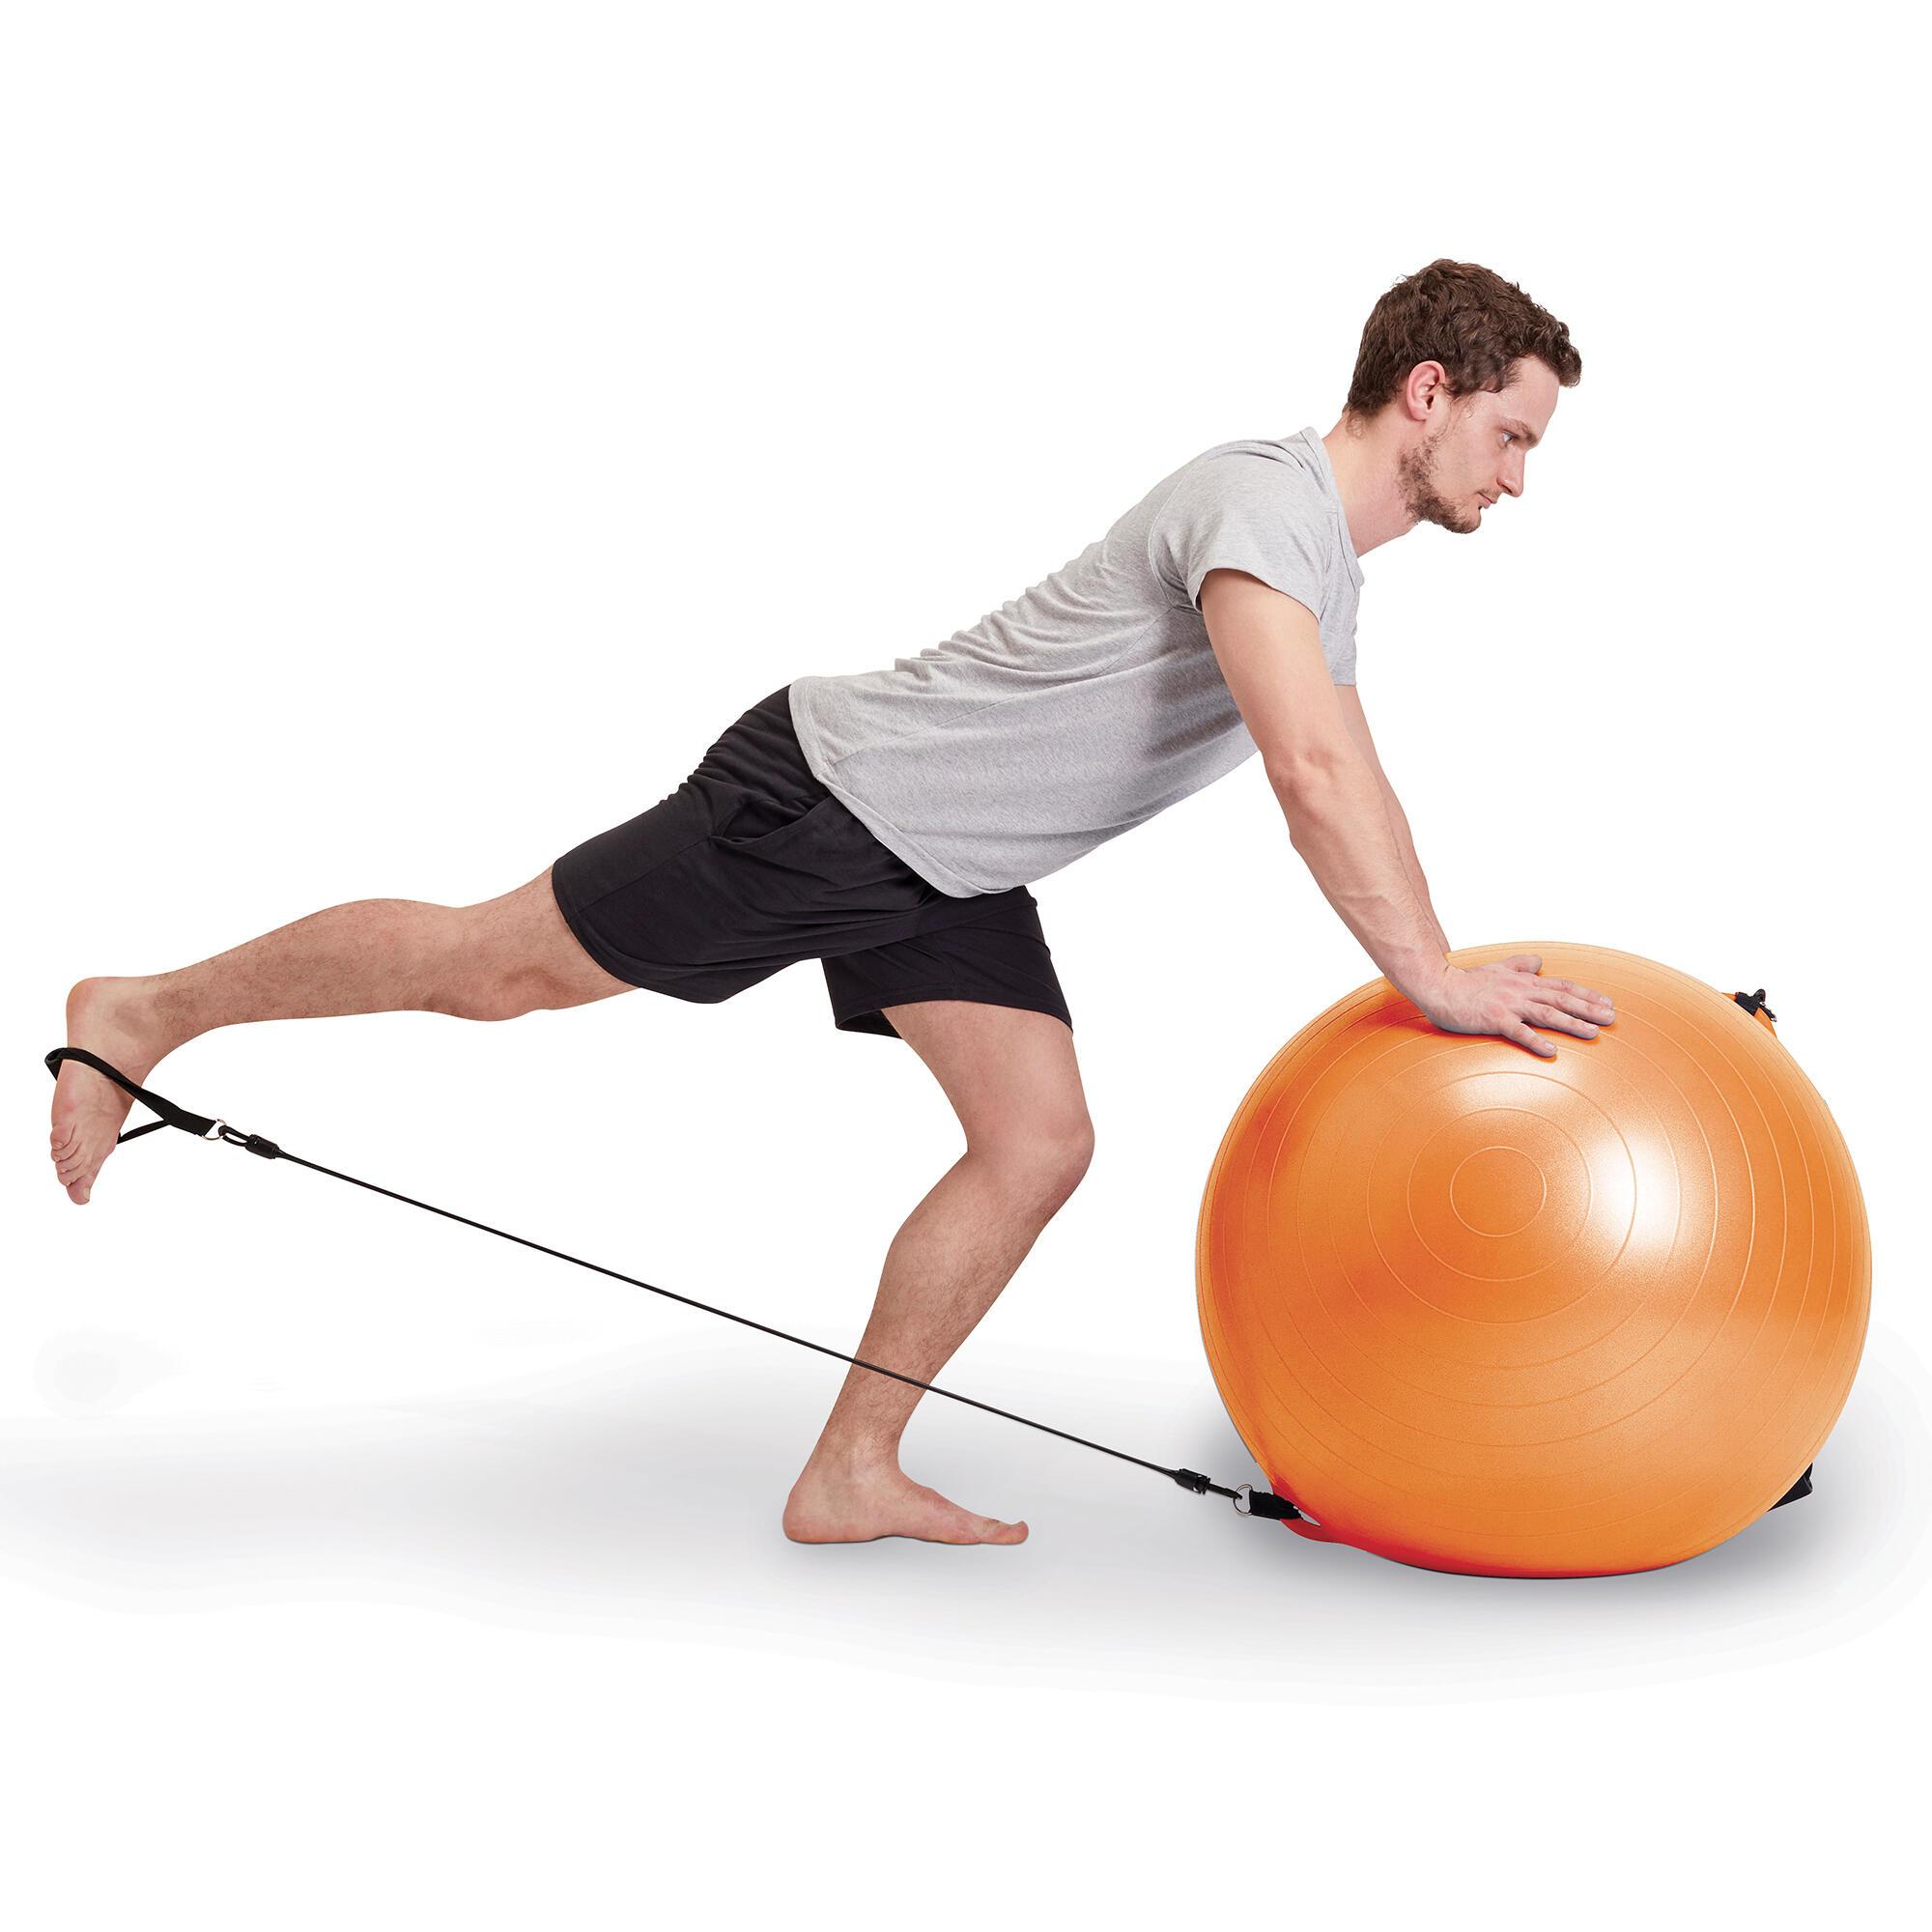 Comprar Fitball y Pelotas de Pilates Online  83420f015bd1